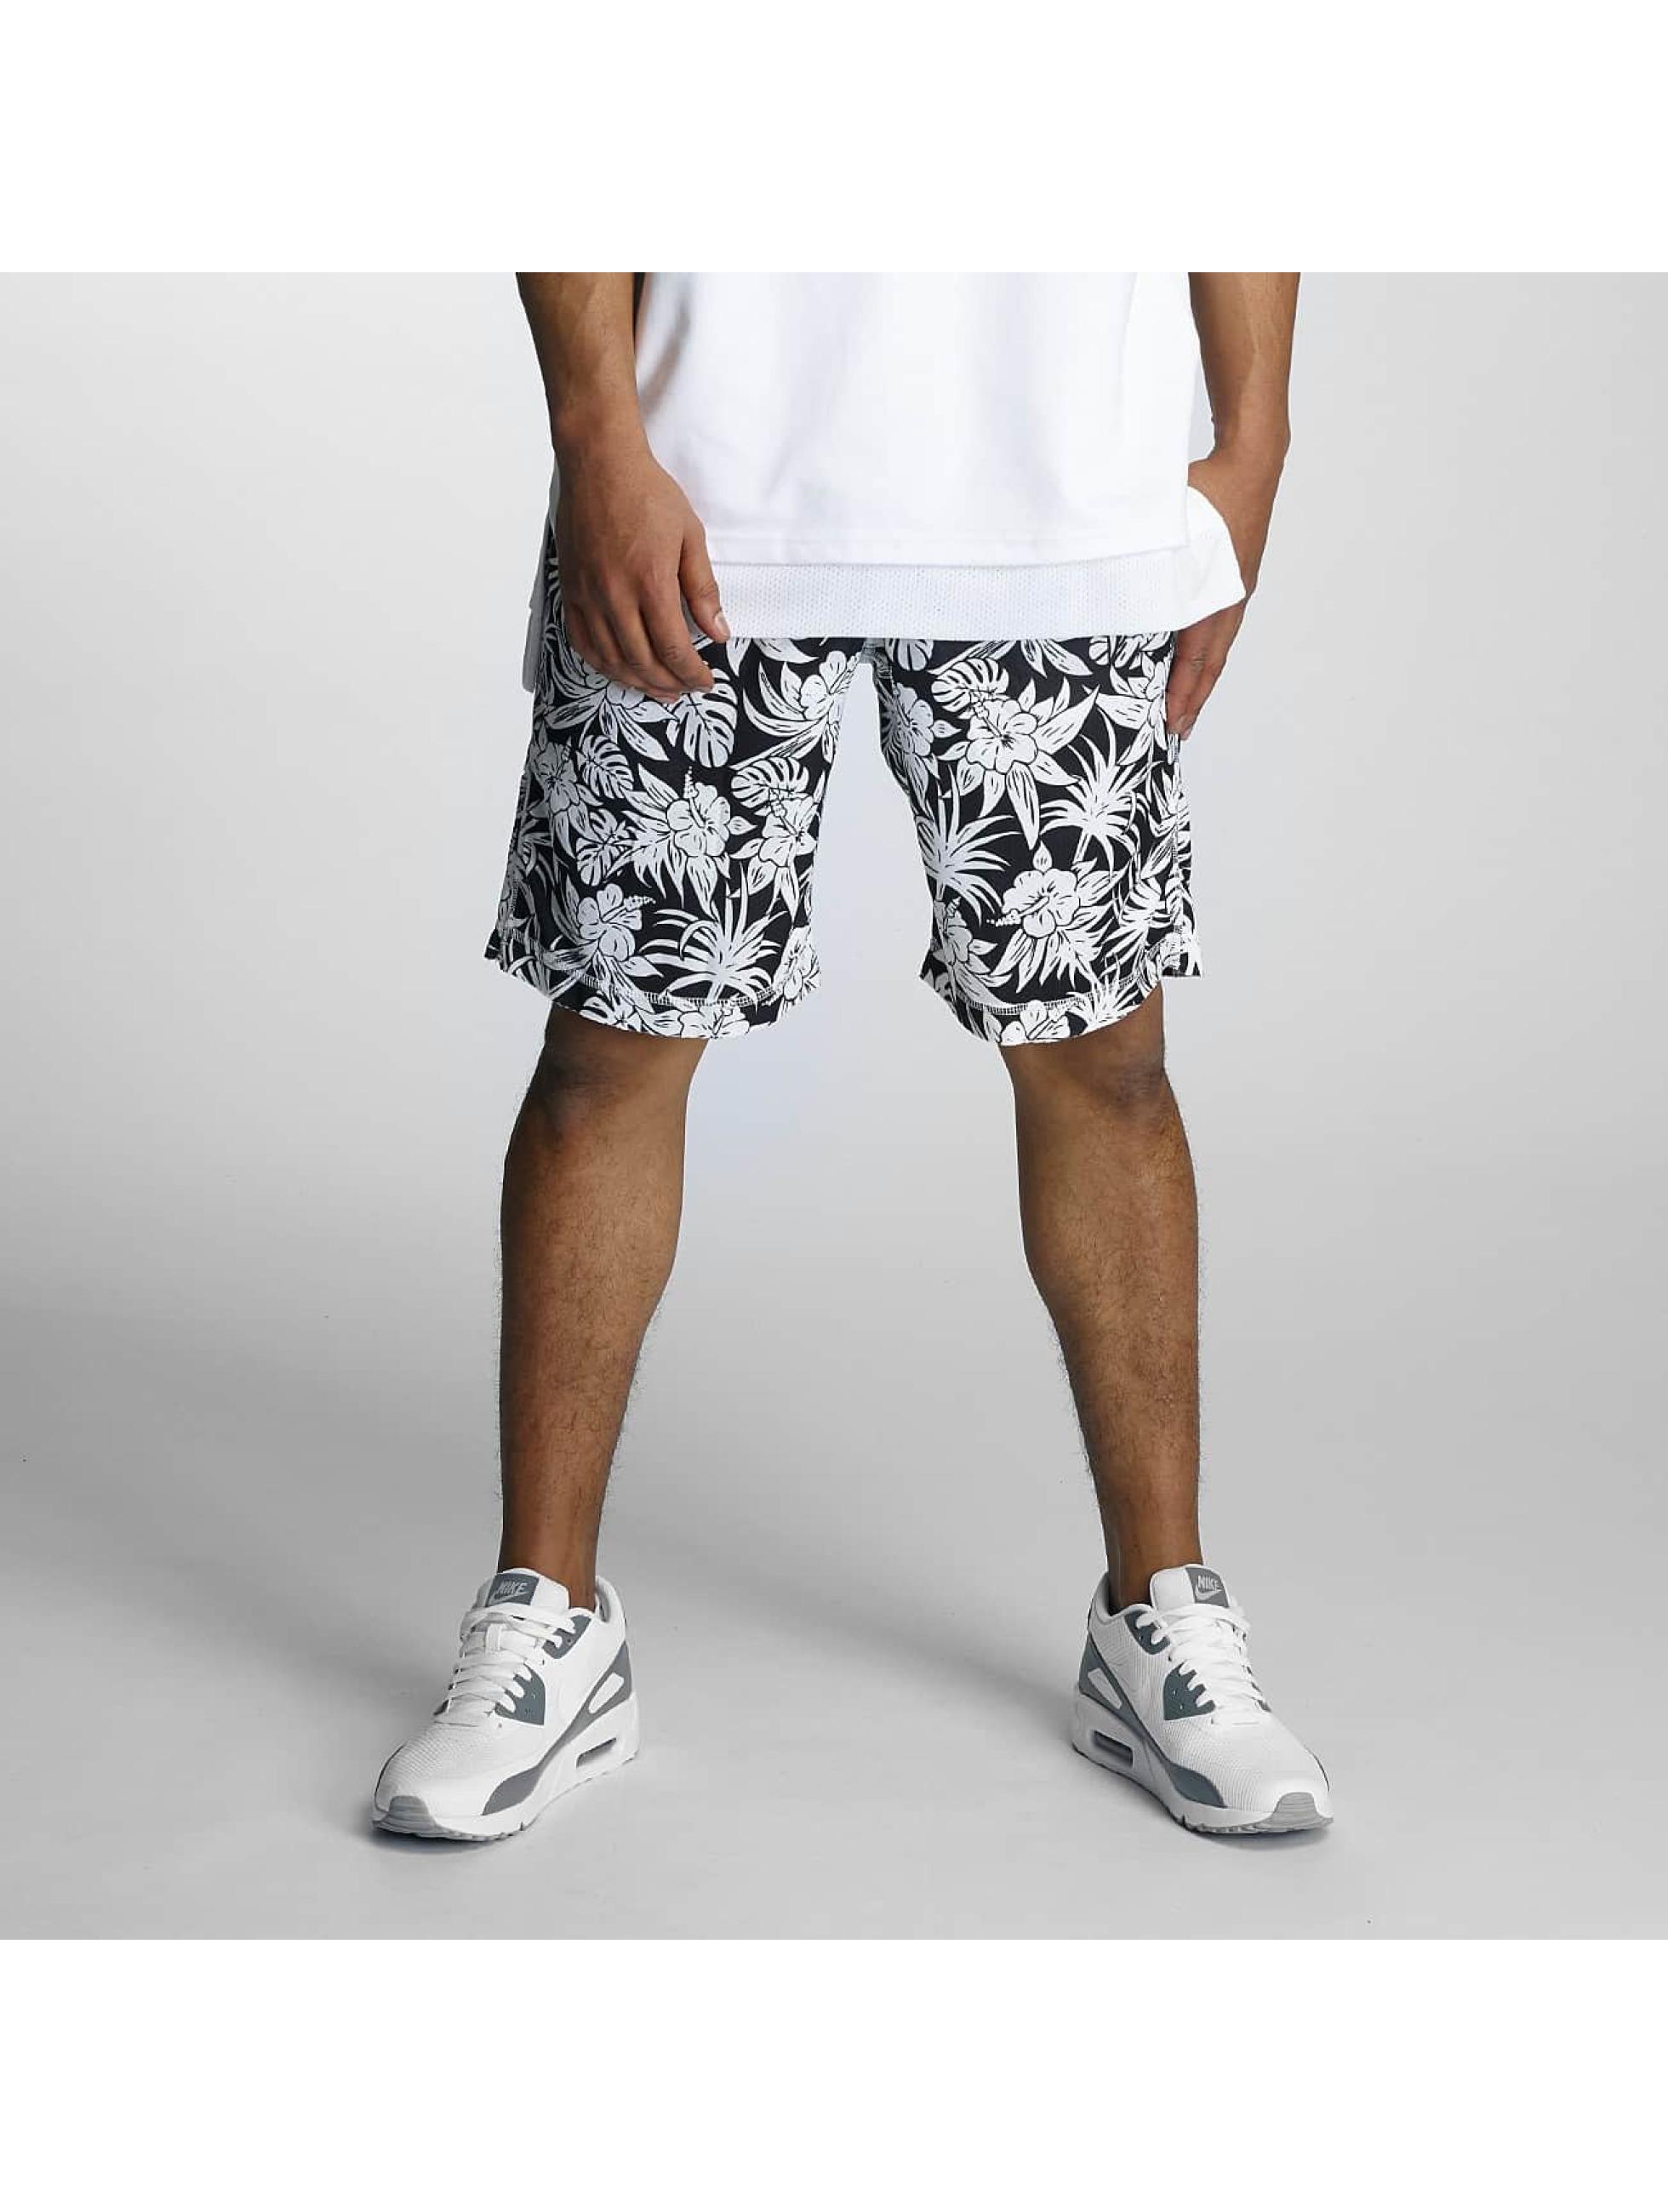 Nike SB Männer Shorts Dry in schwarz